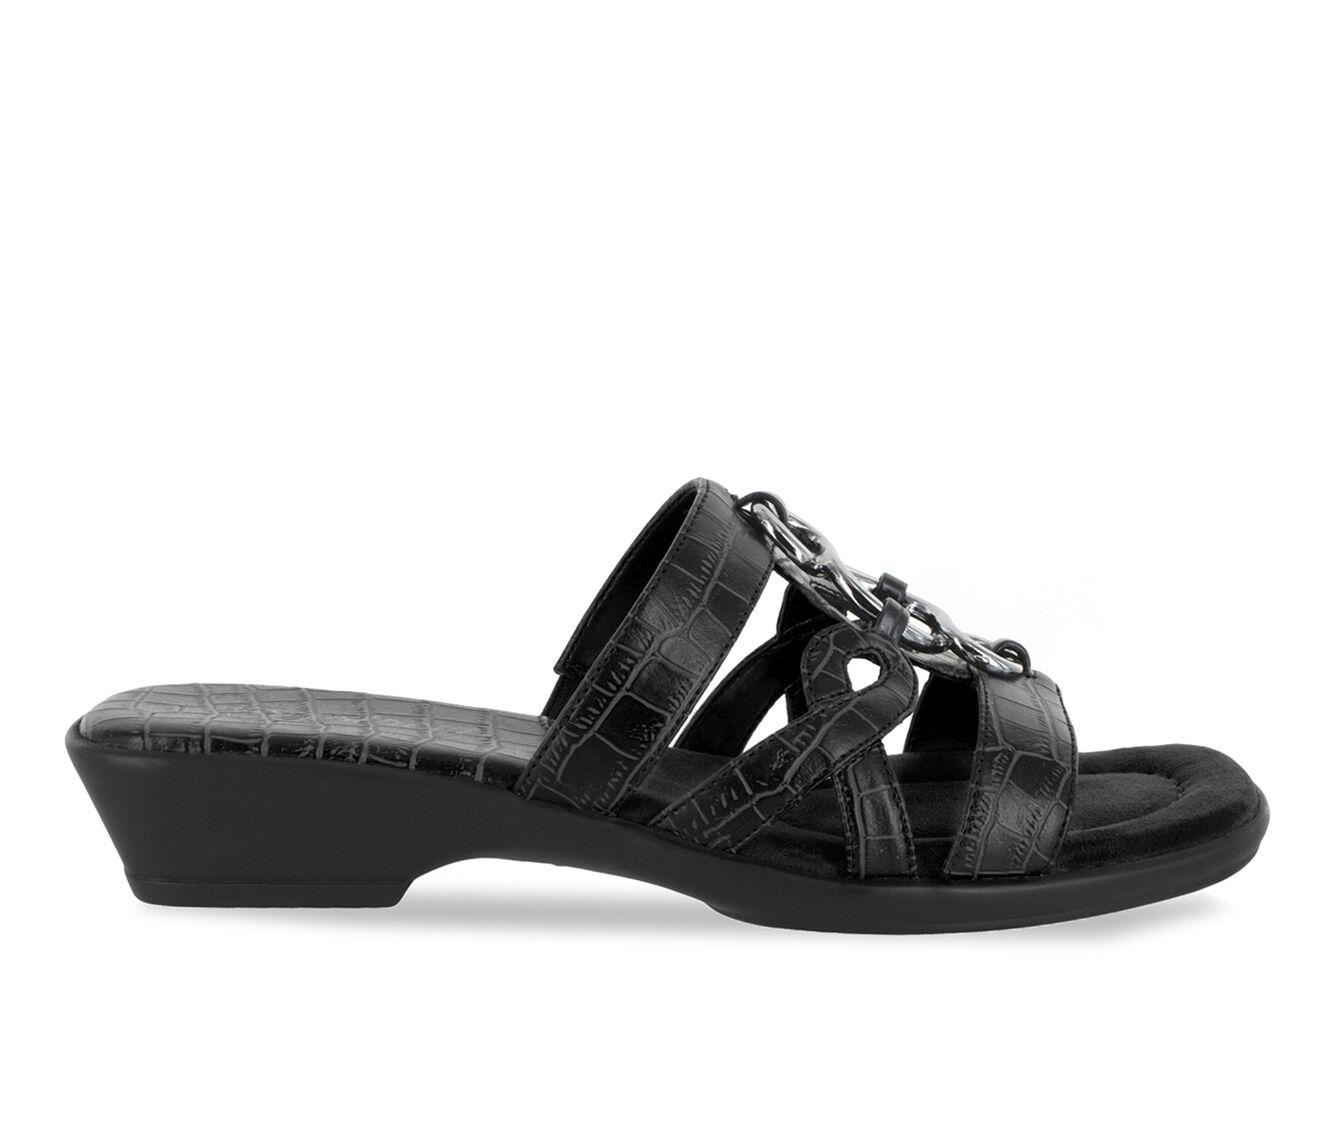 Women's Easy Street Torrid Sandals Black Croco